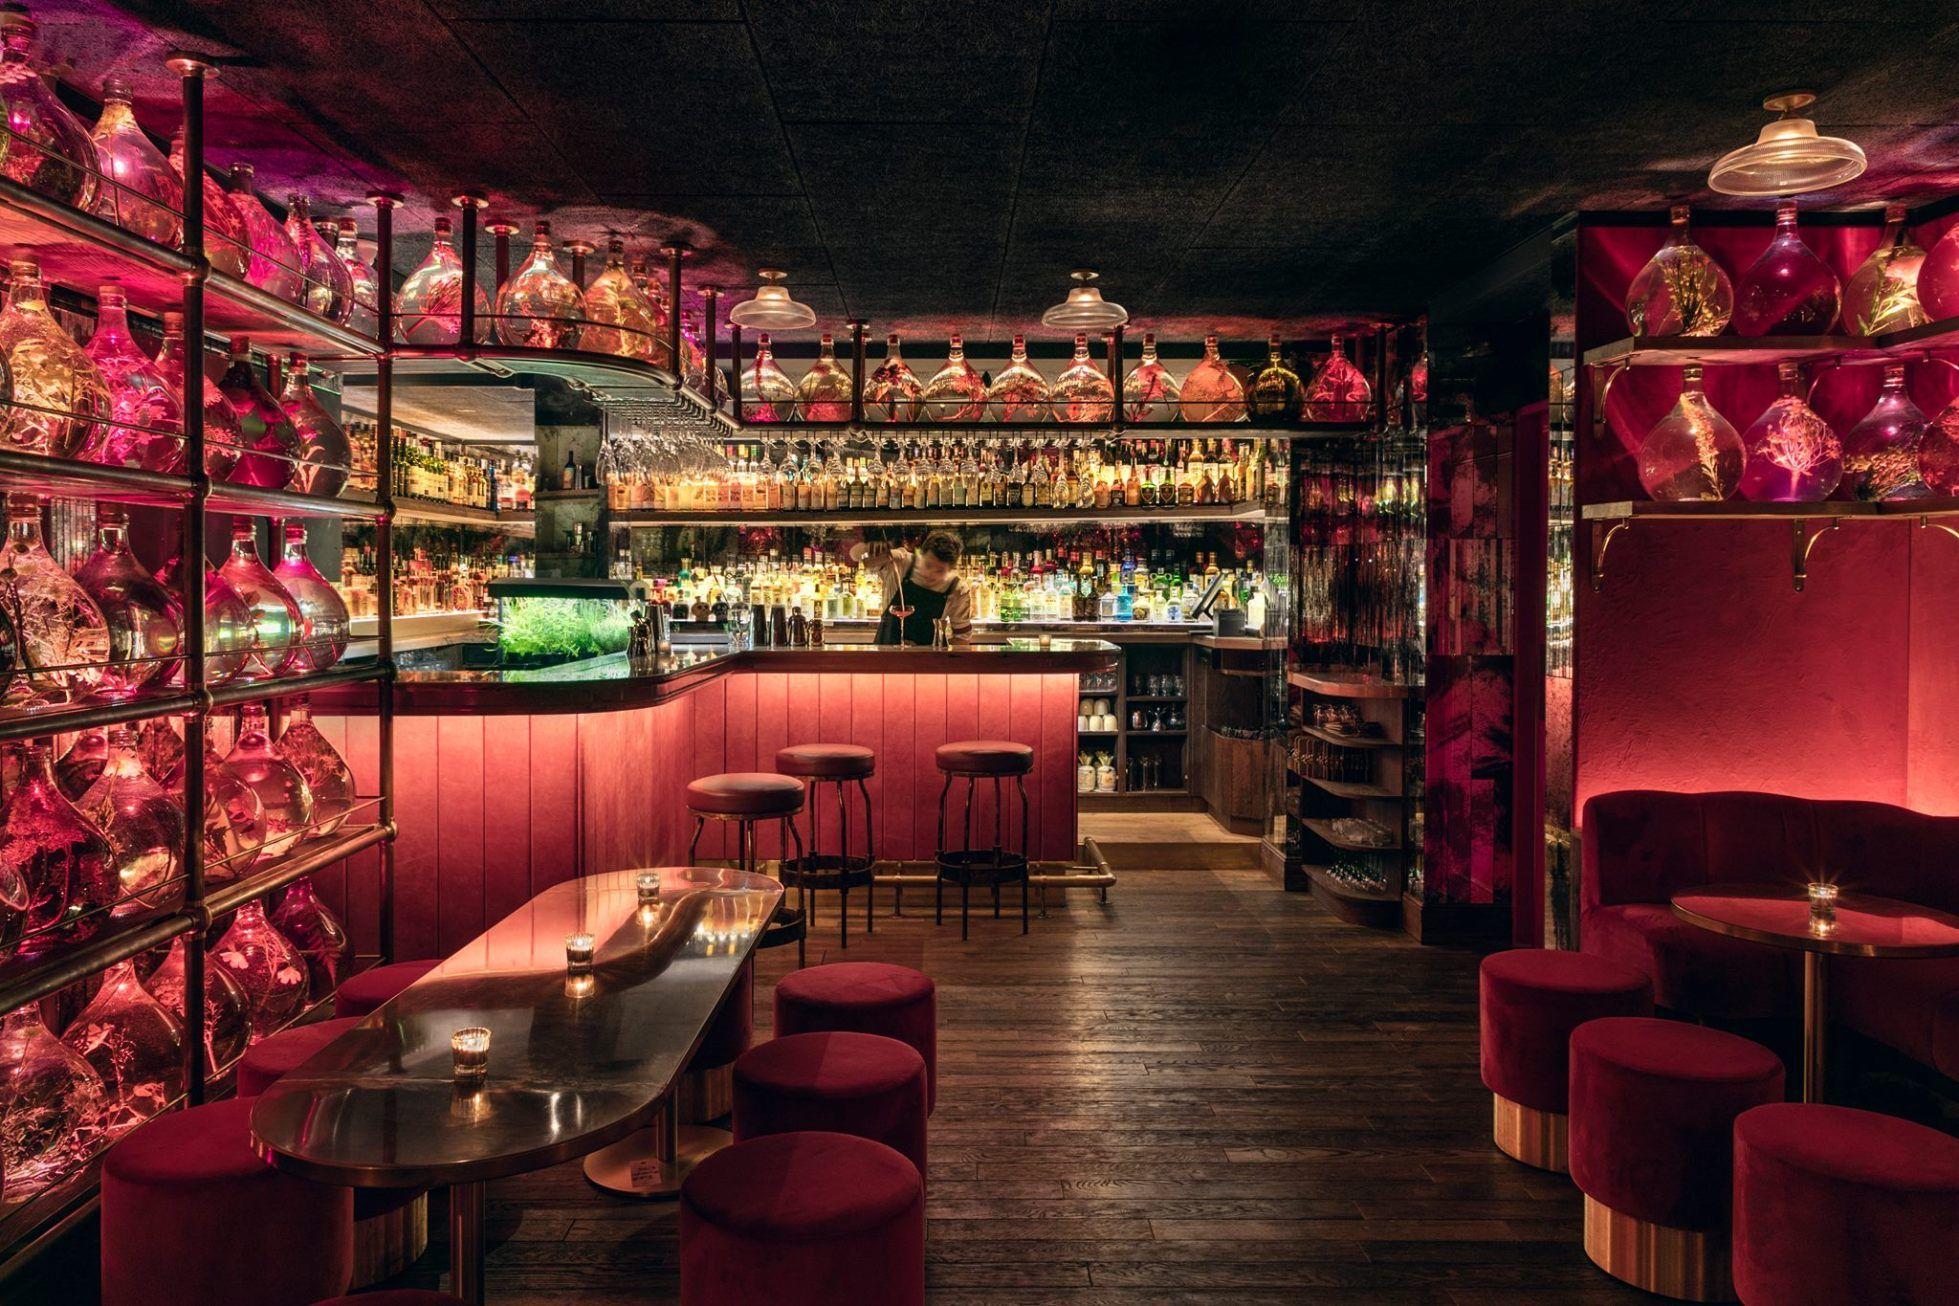 Speakeasies The Top Ten Hidden Bars In Paris The Earful Tower Cocktail Bar Interior Hidden Bar Cocktail Bar Design